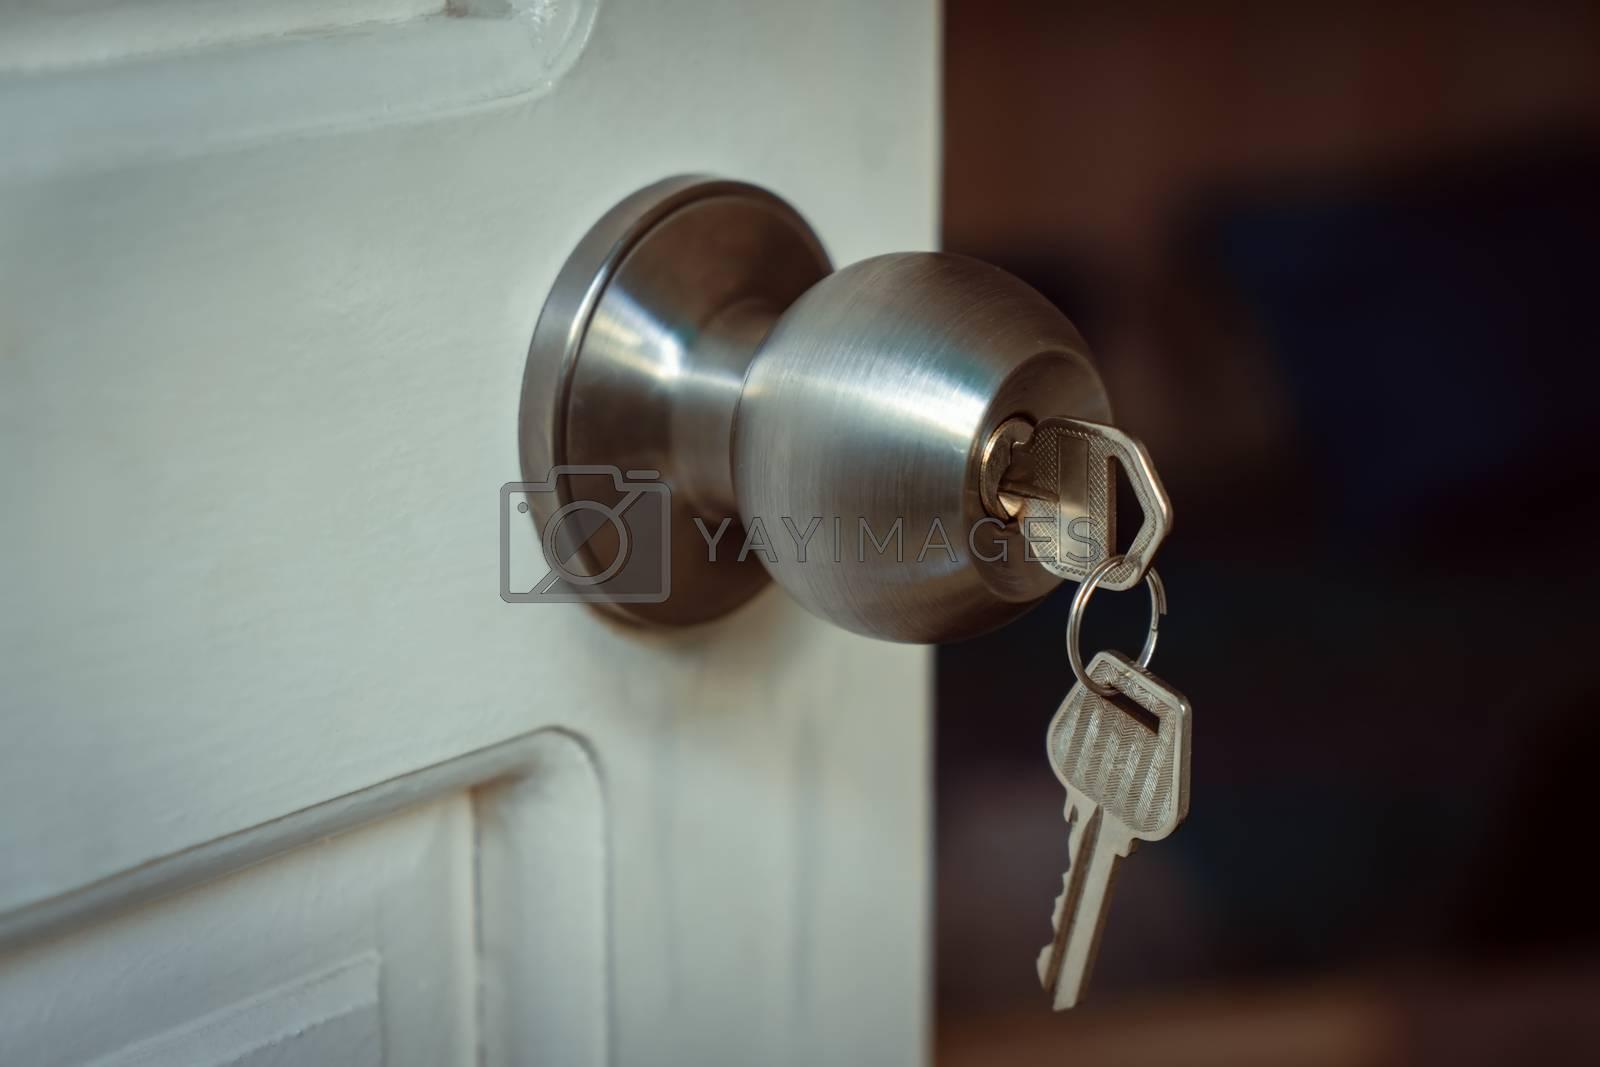 Key put in a knob lock on a white open door